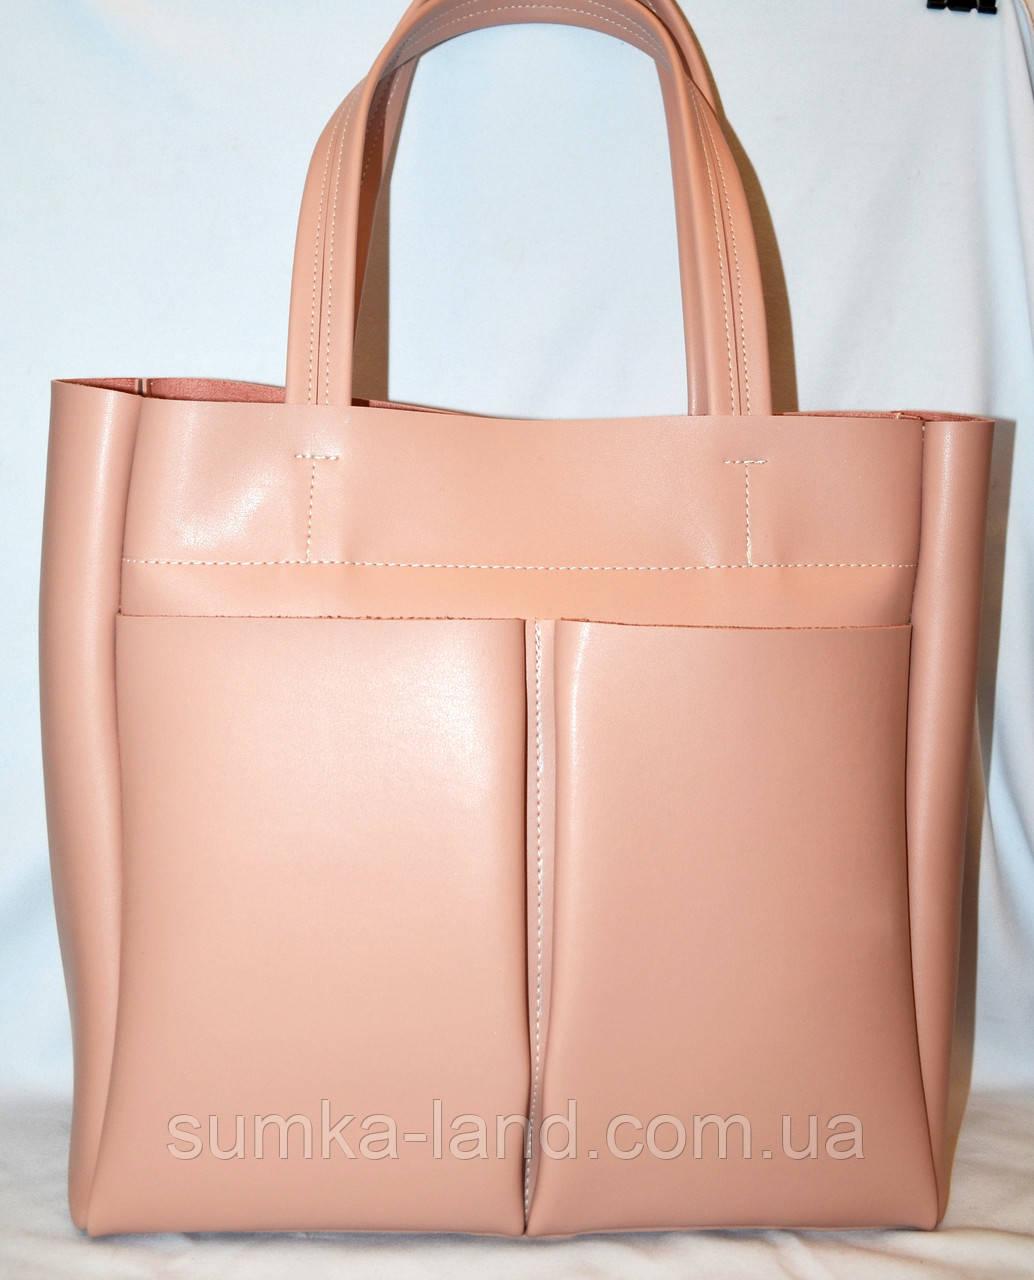 aeb9ff9ed03a Женская пудровая элитная сумка B Elit с двумя карманами 32 33 ...